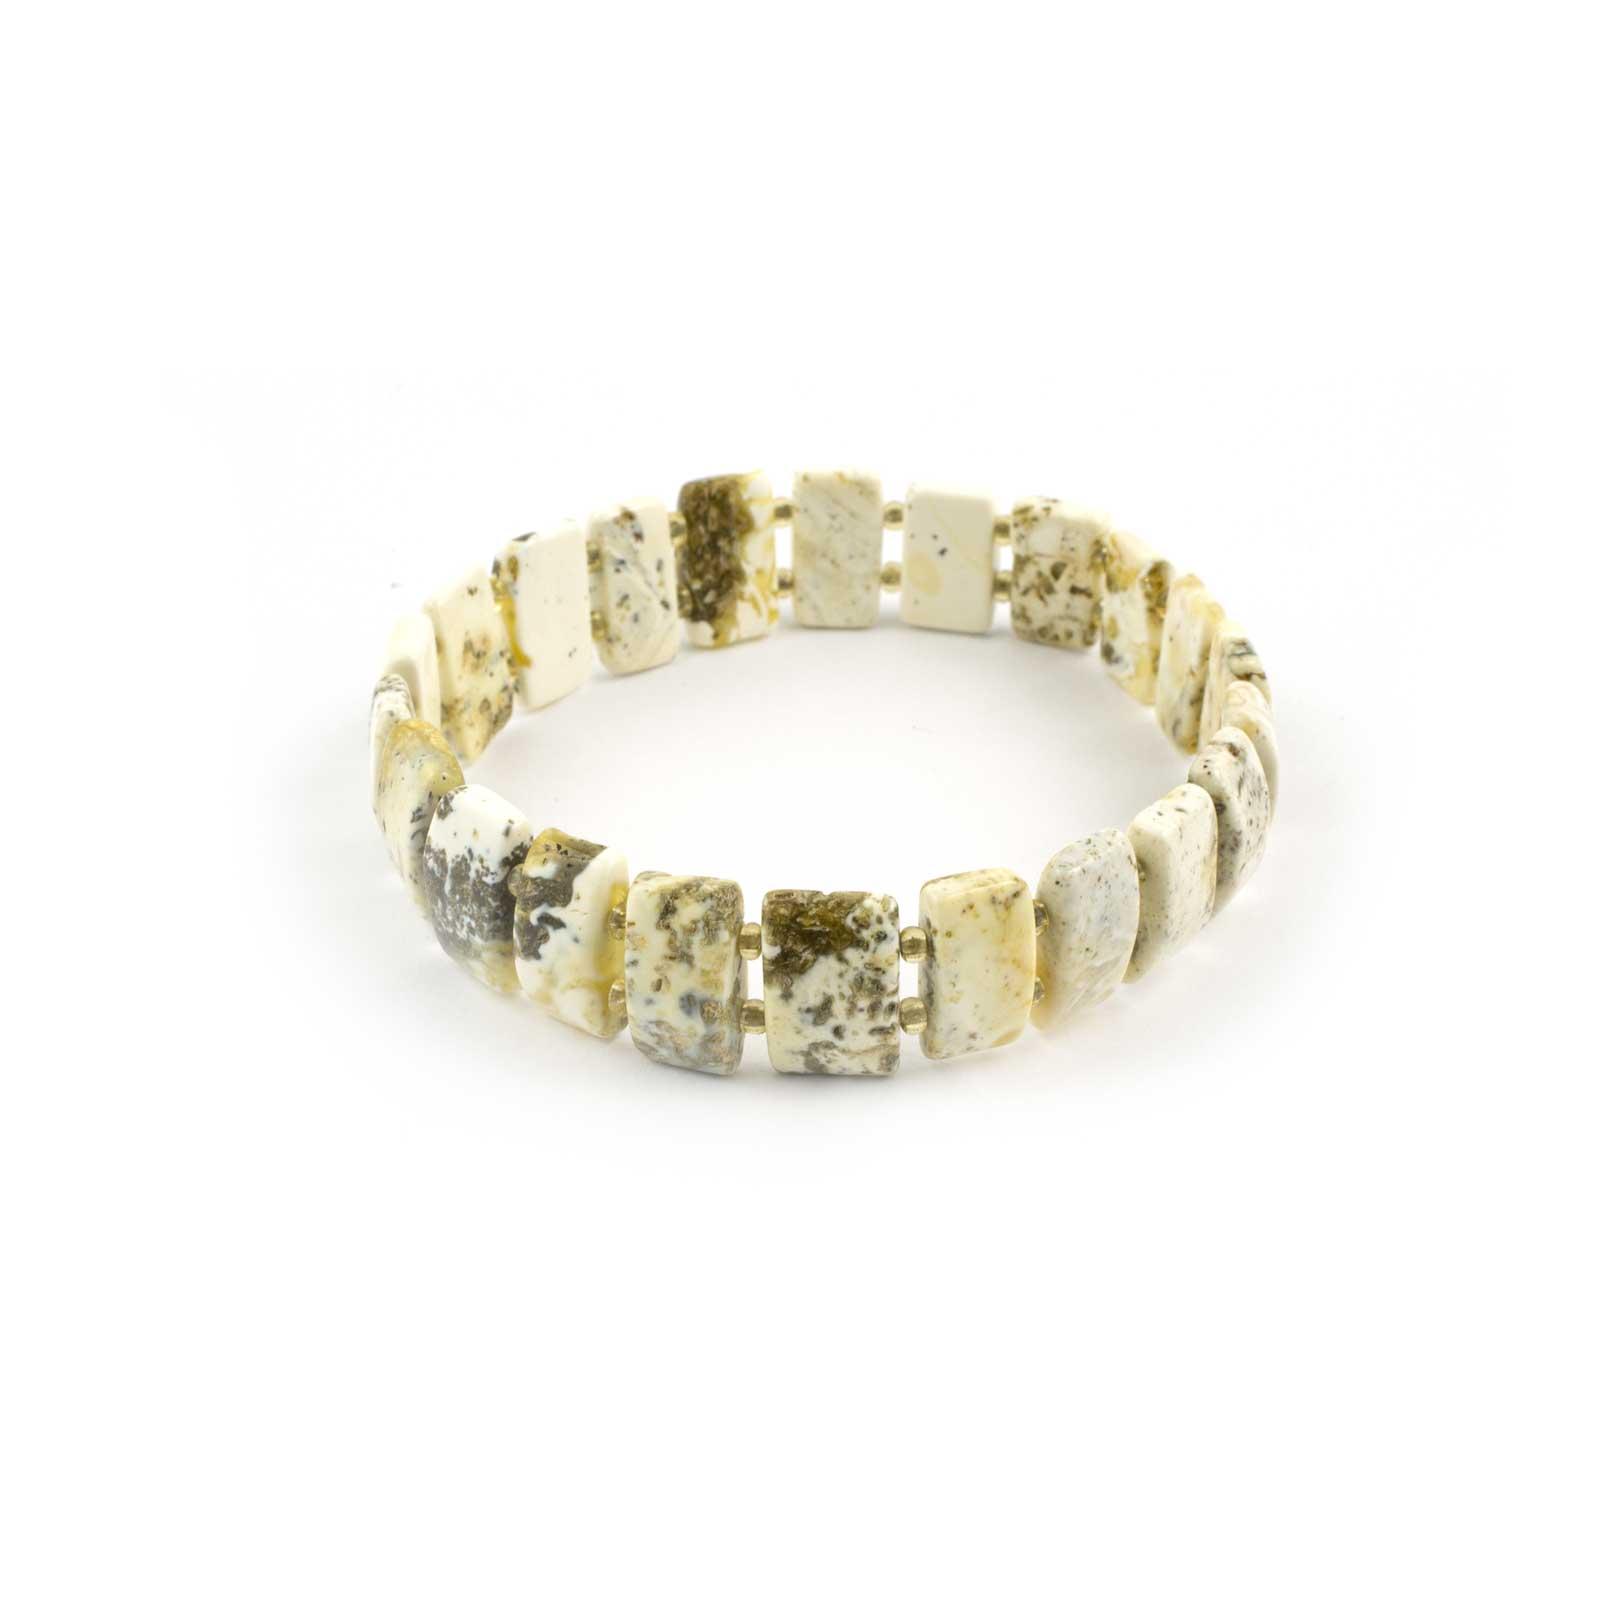 Flat Stylish Natural Baltic Amber Bracelet